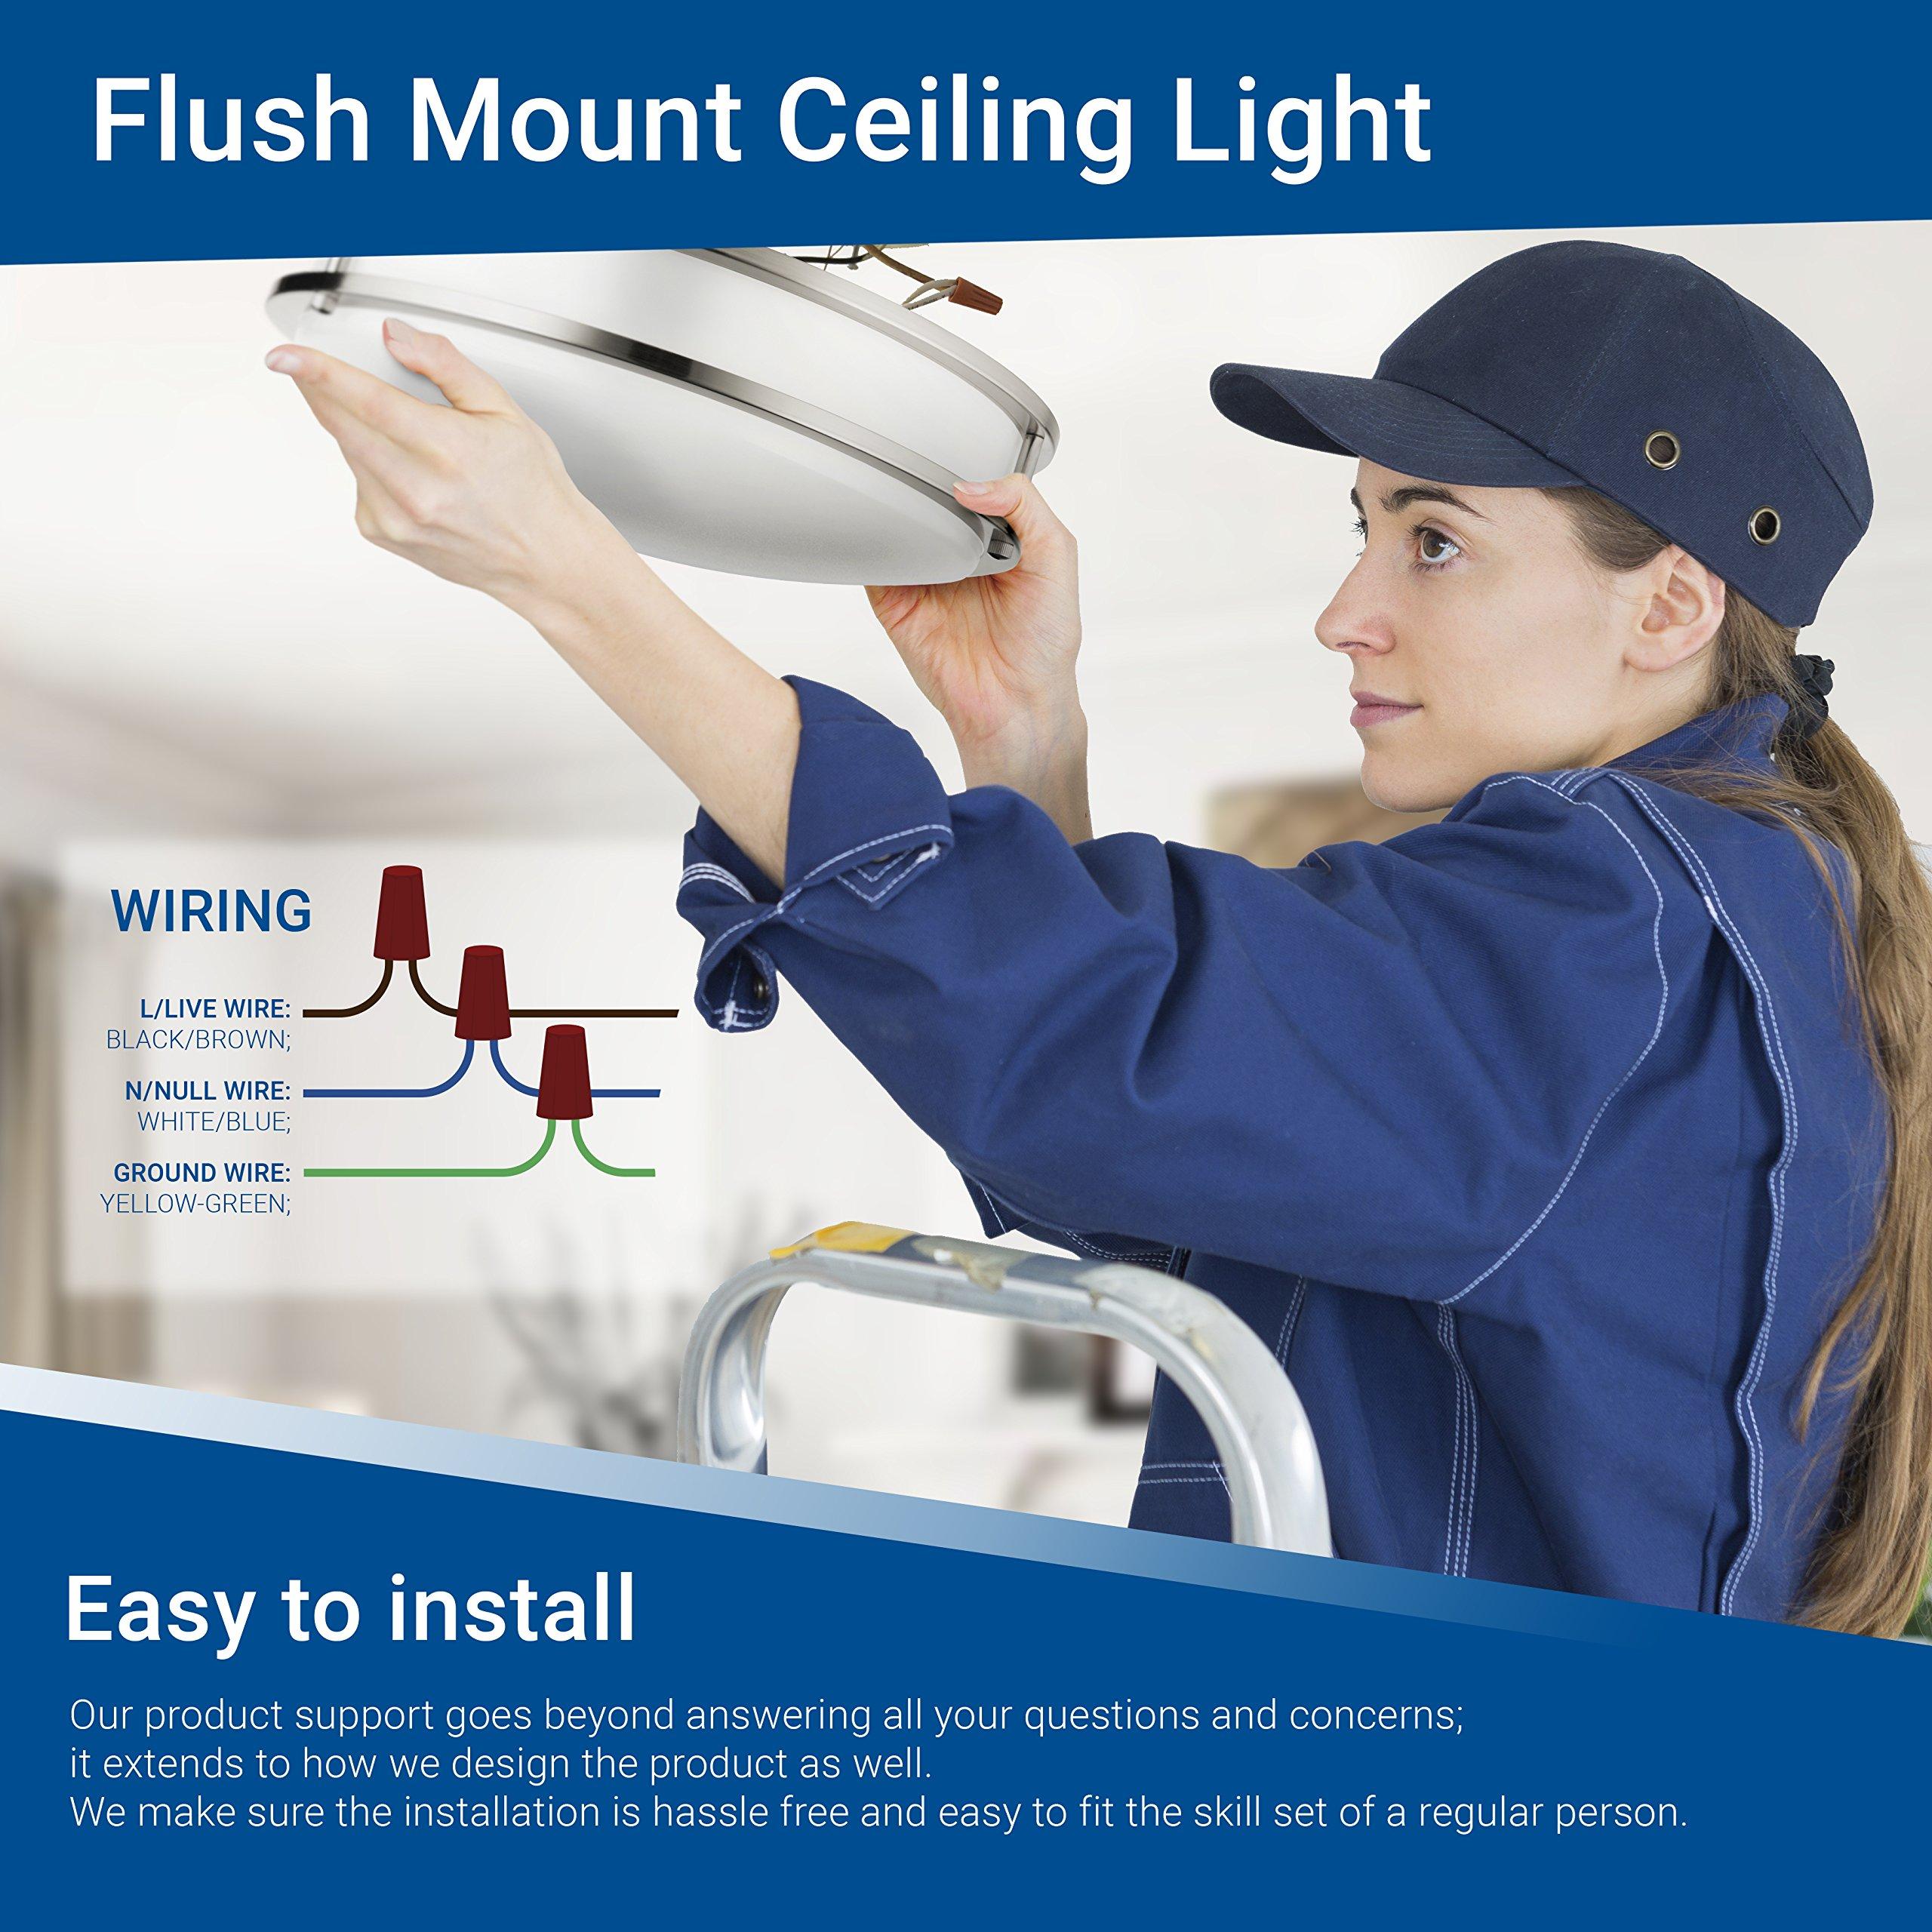 Hyperikon LED Flush Mount Ceiling Light, 14'', 100W equivalent, 1980lm, 4000K (Daylight Glow), 120V, 14-Inch, Dimmable by Hyperikon (Image #8)